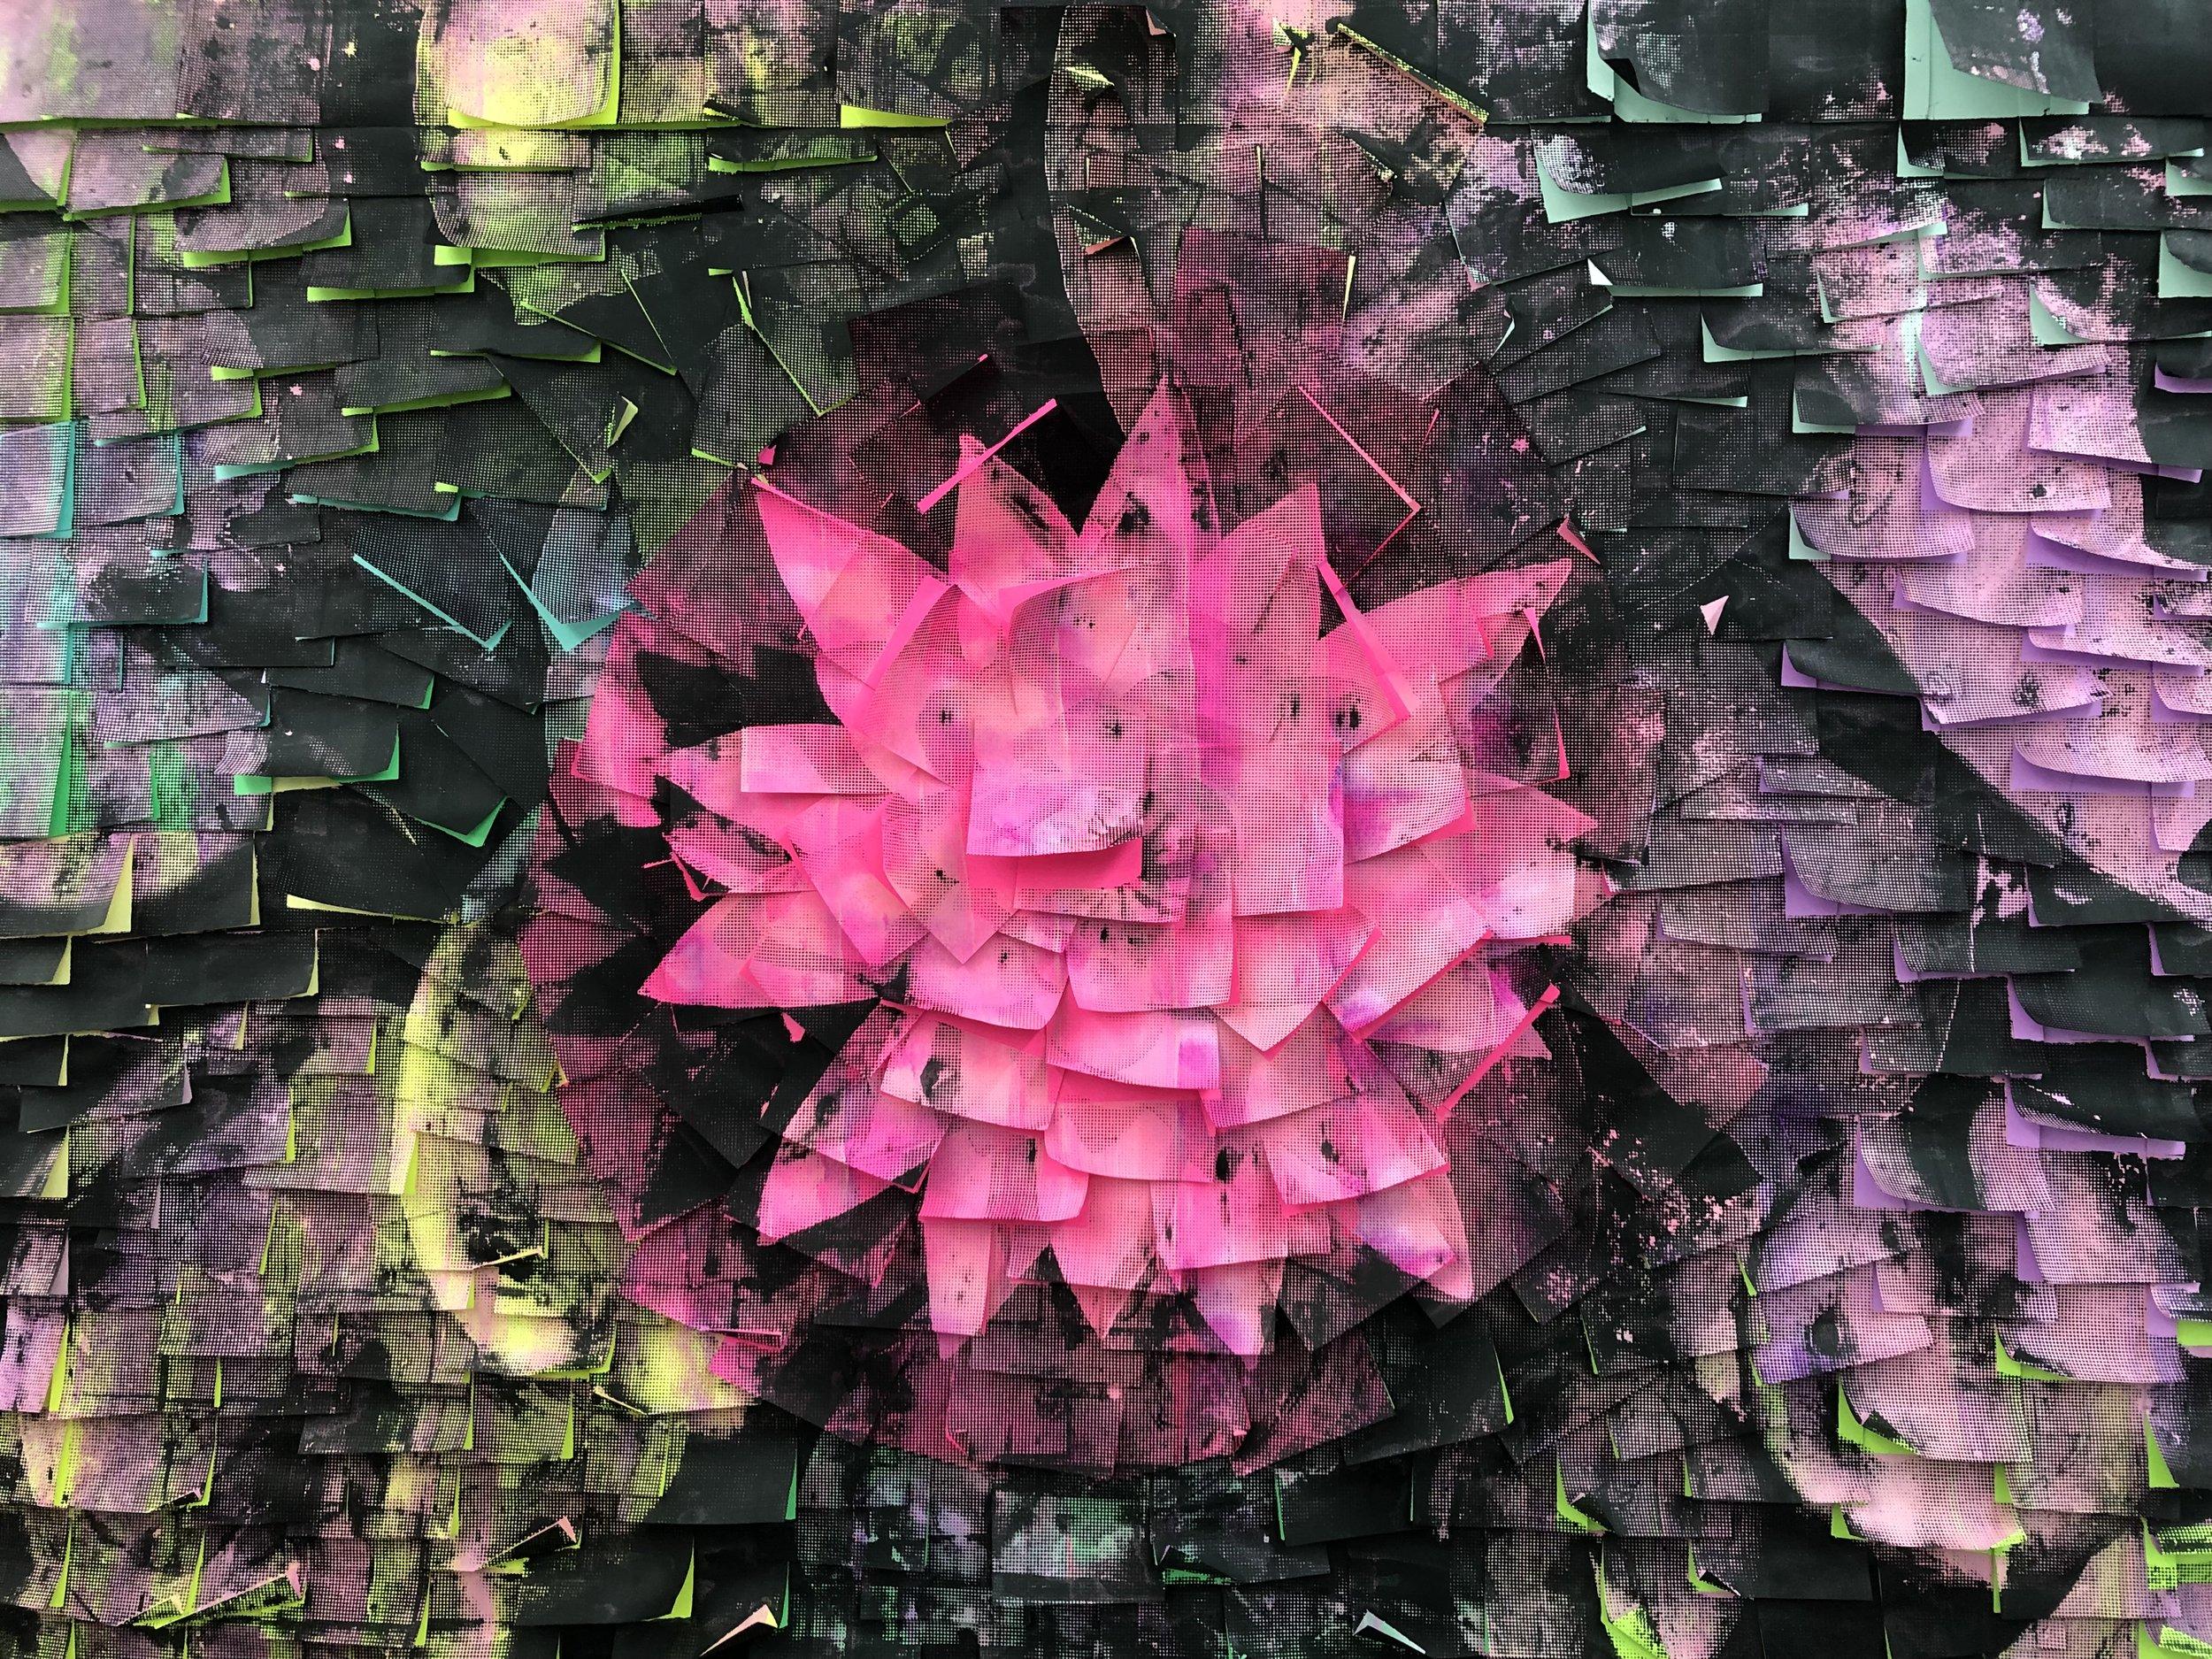 Ardan Özmenoglu,  Allien , 2019, Painting and silk screen printing on post-it notes, 31.5 x 42 in.